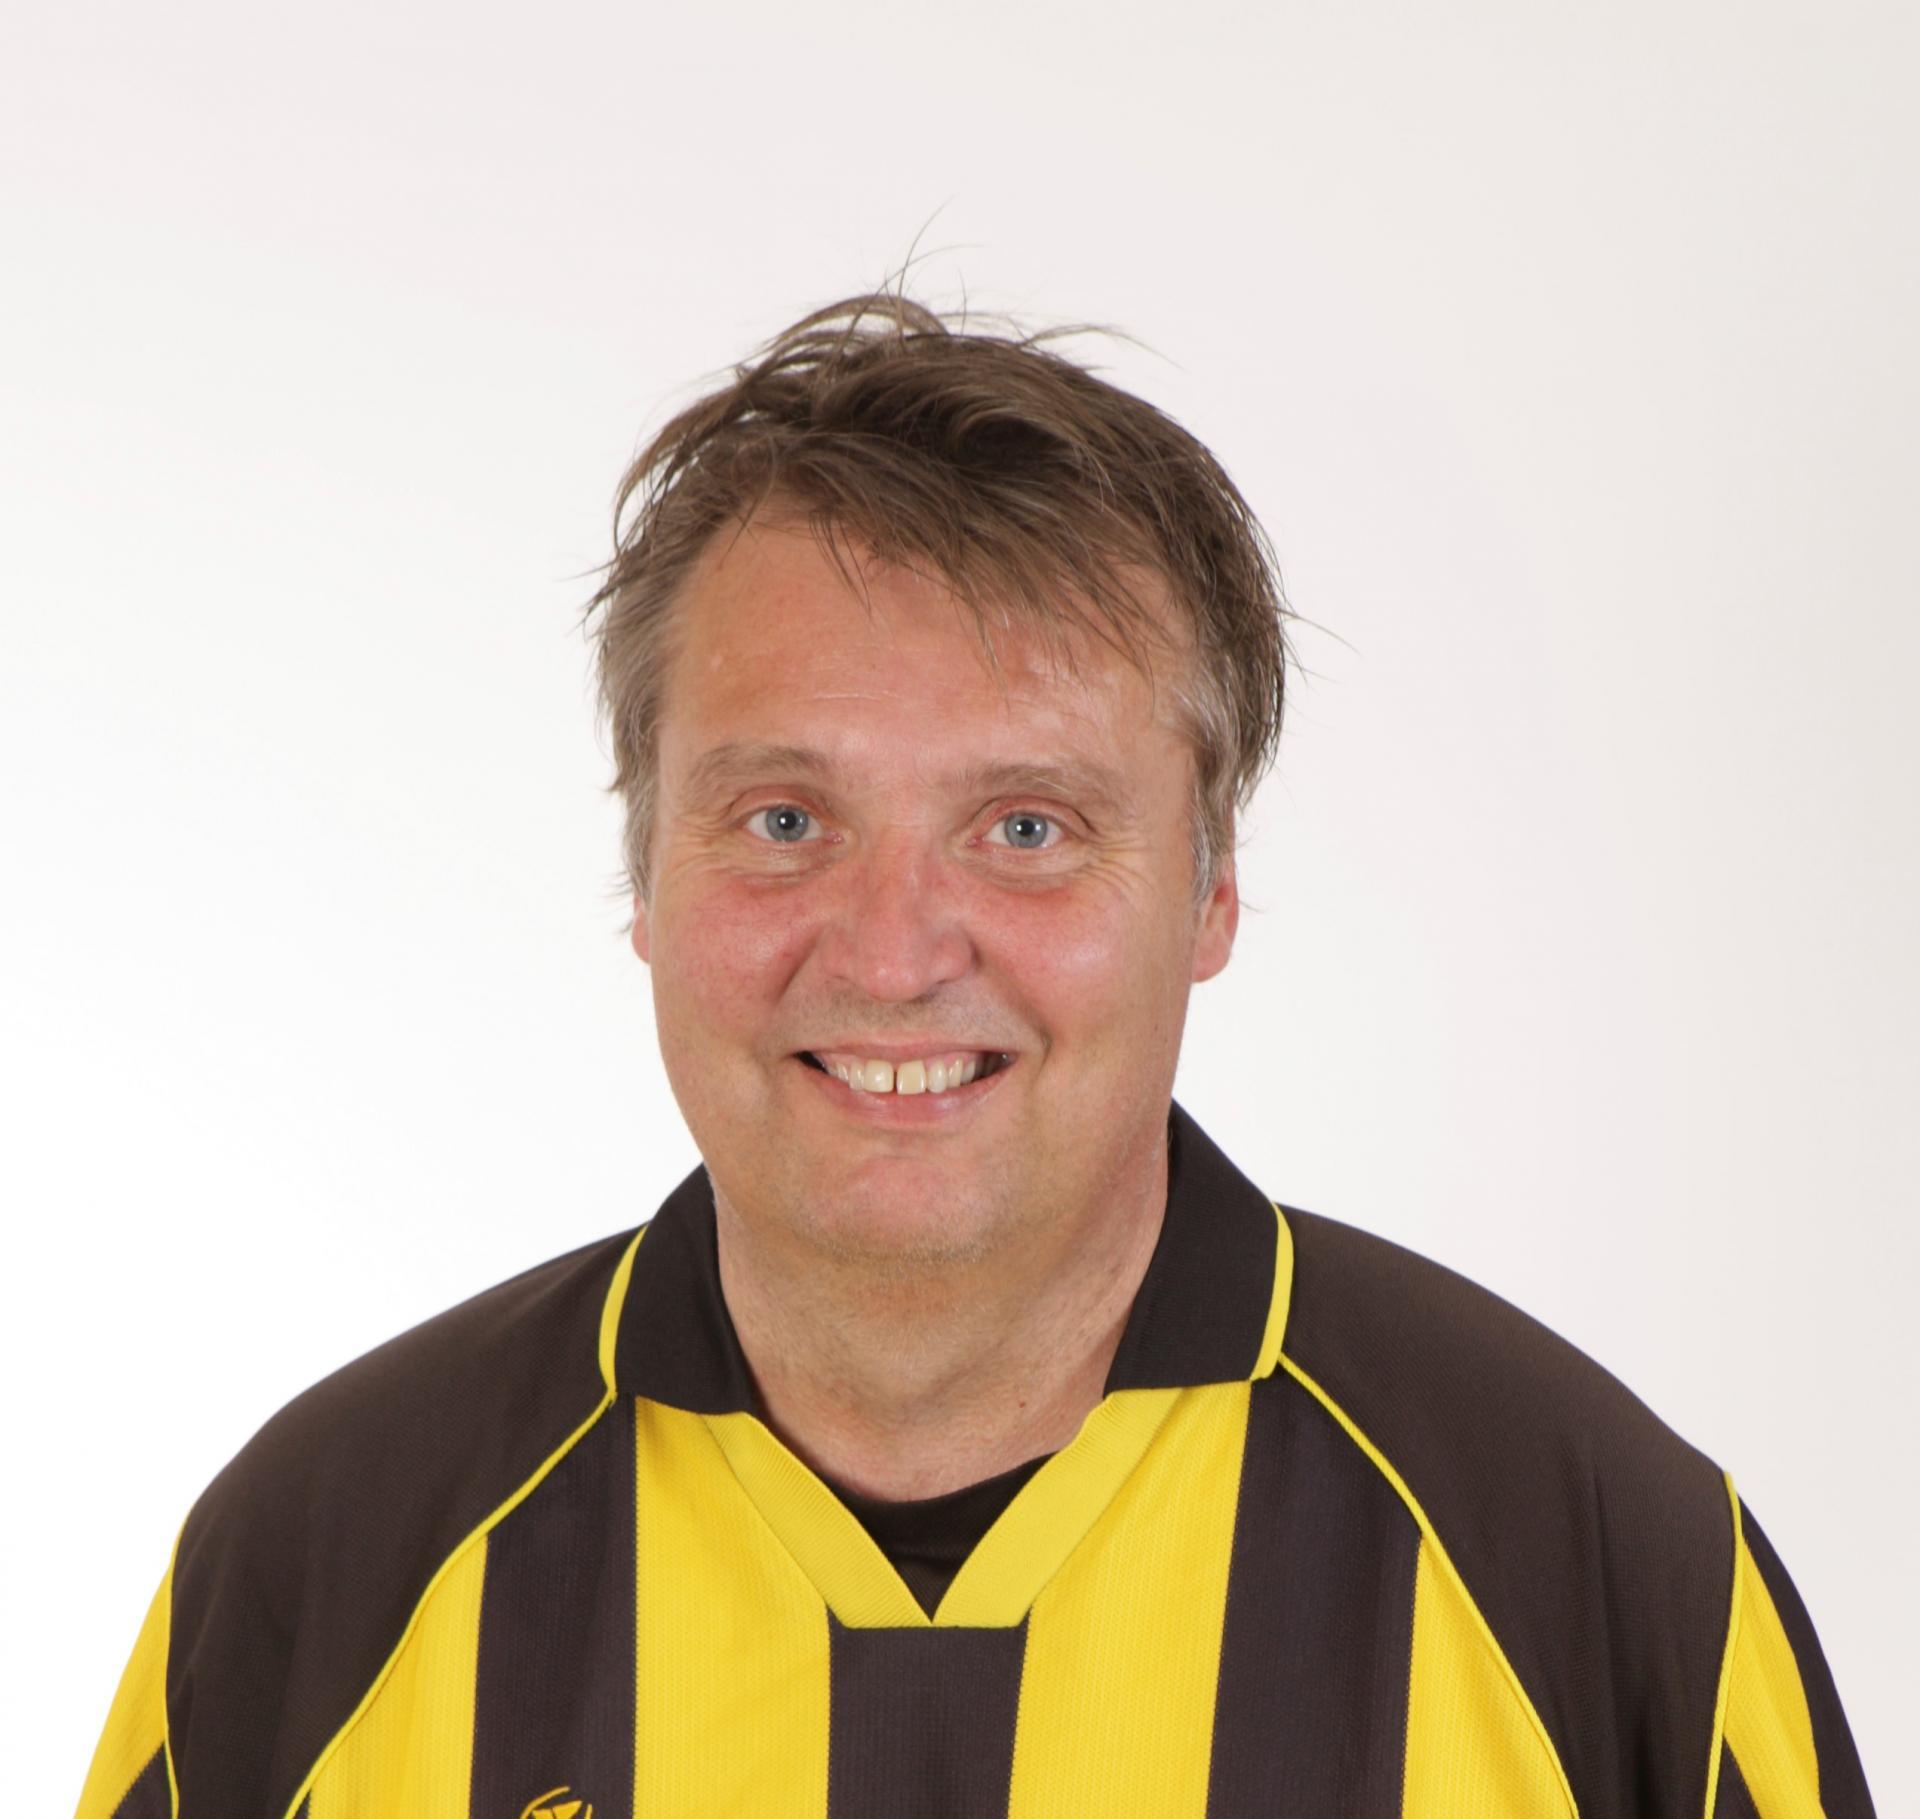 Axel Schwarz